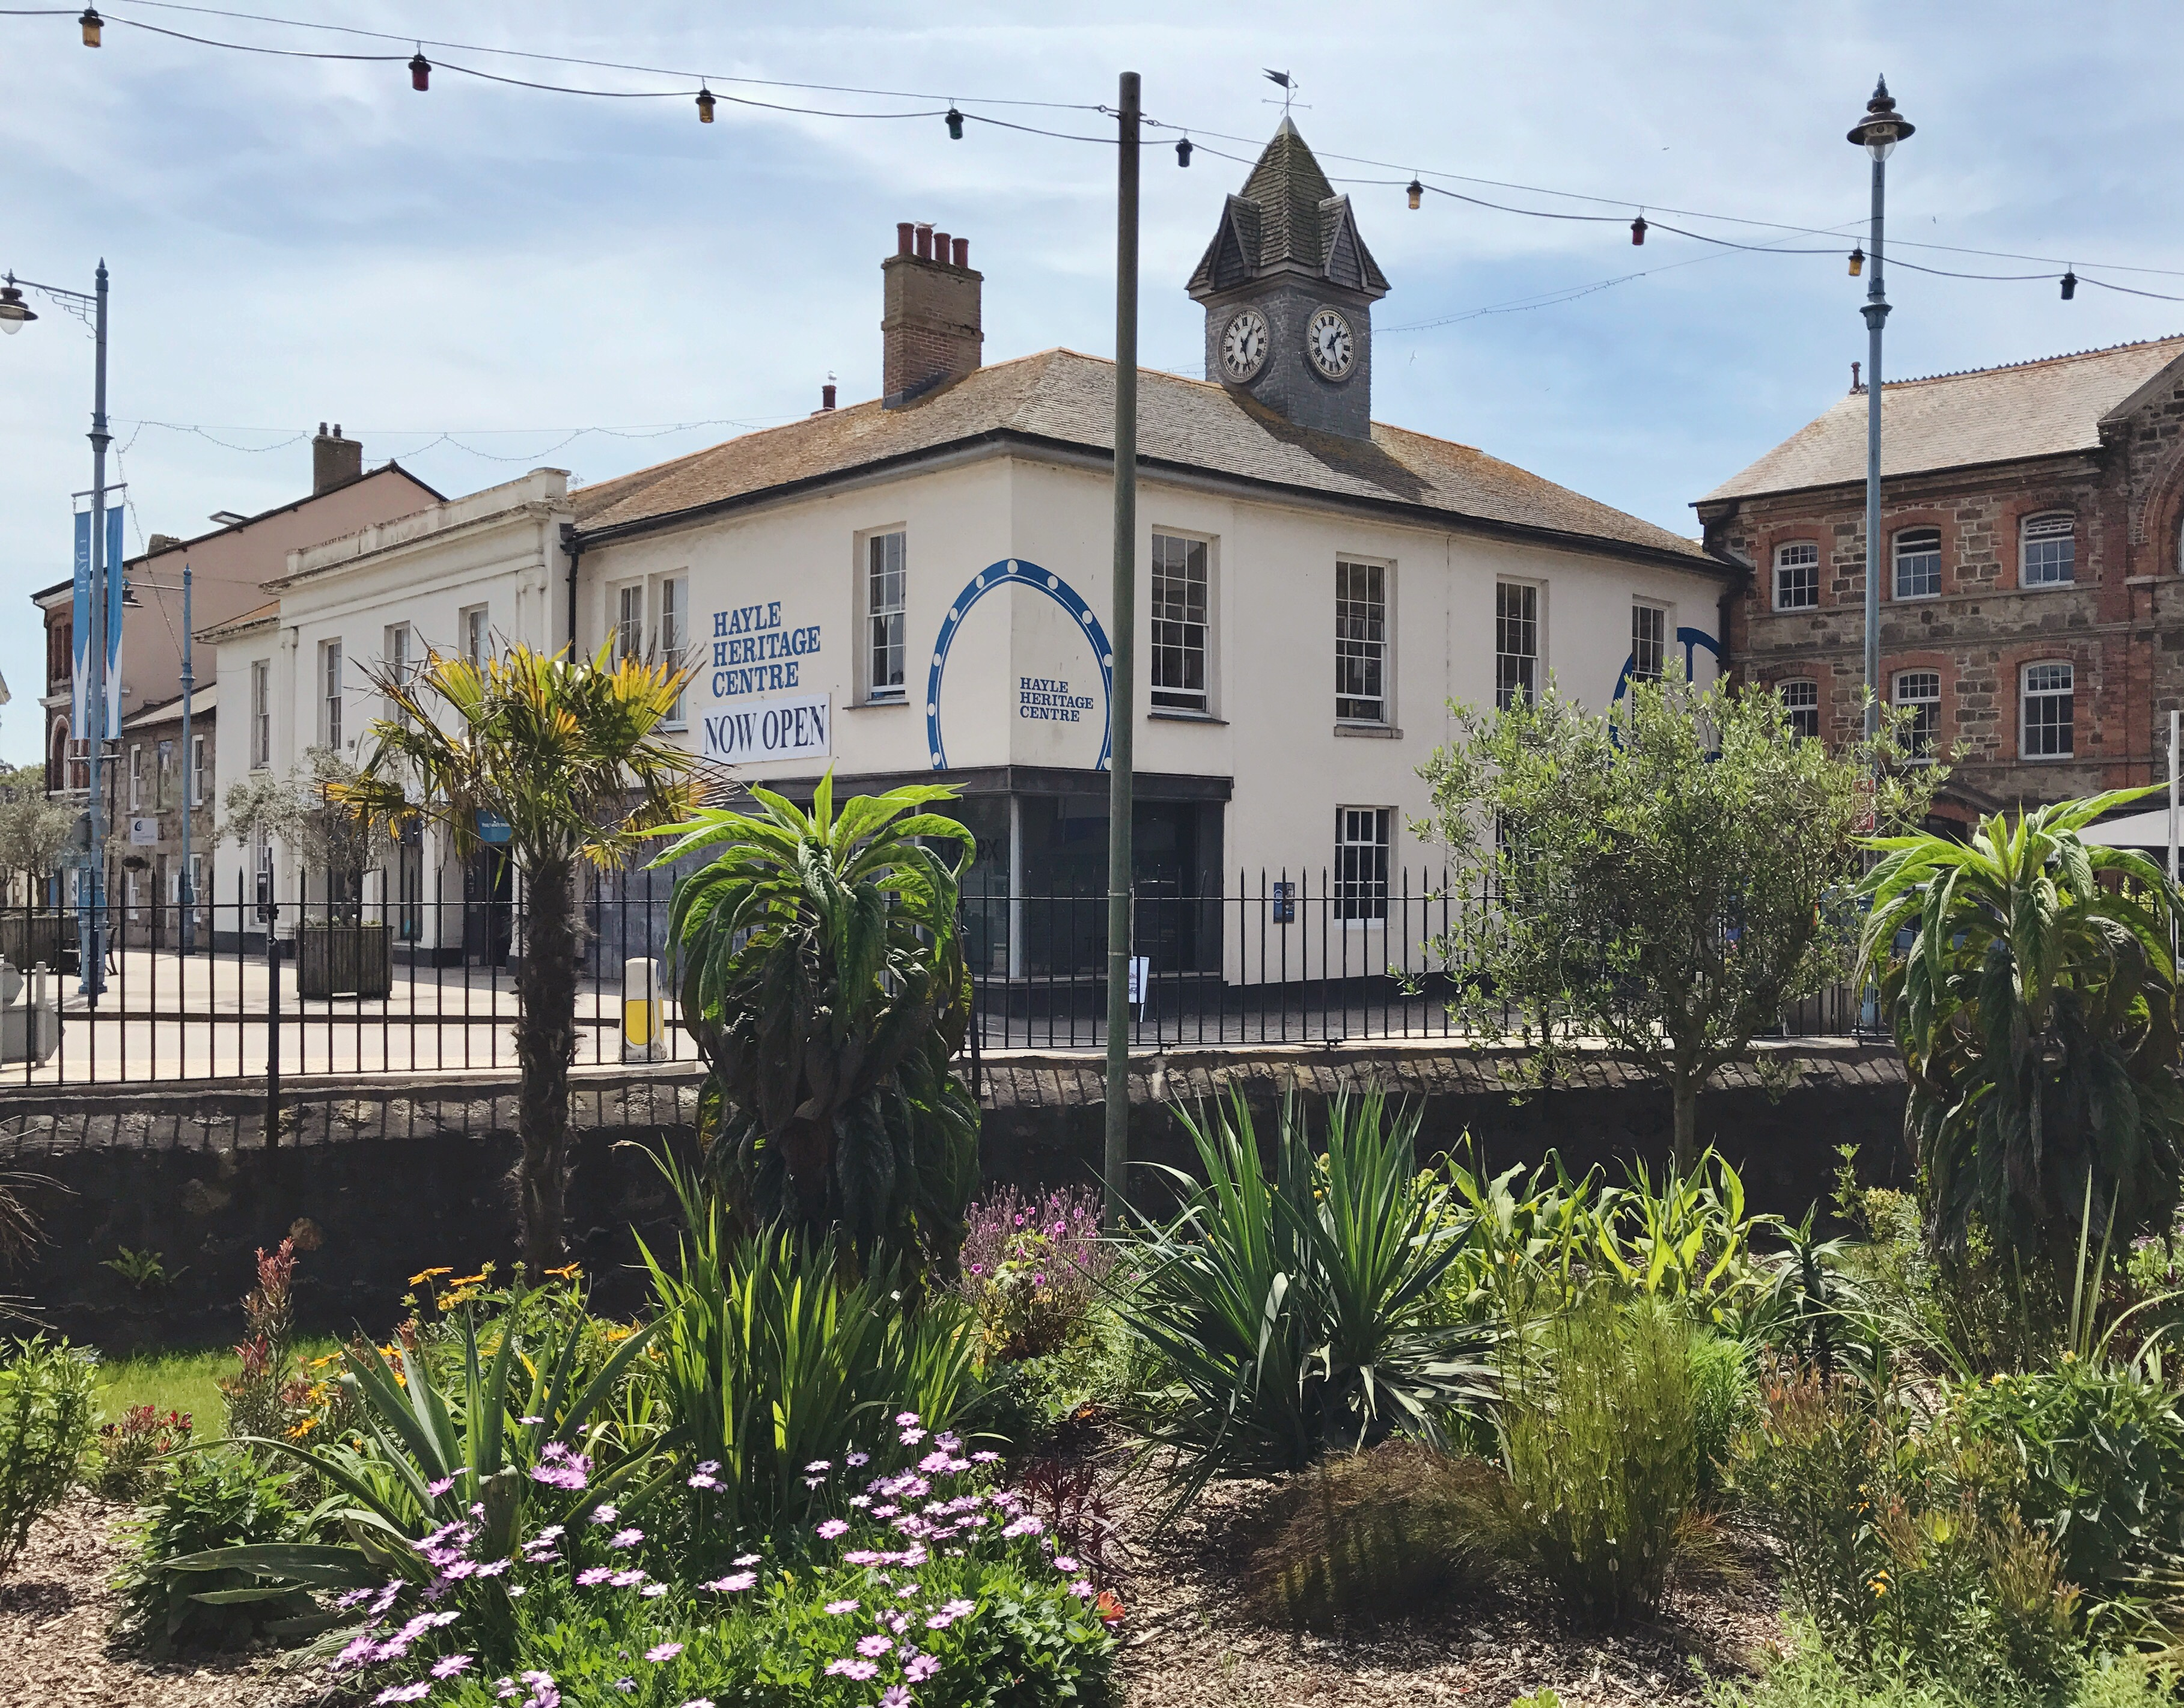 Hayle Heritage Centre